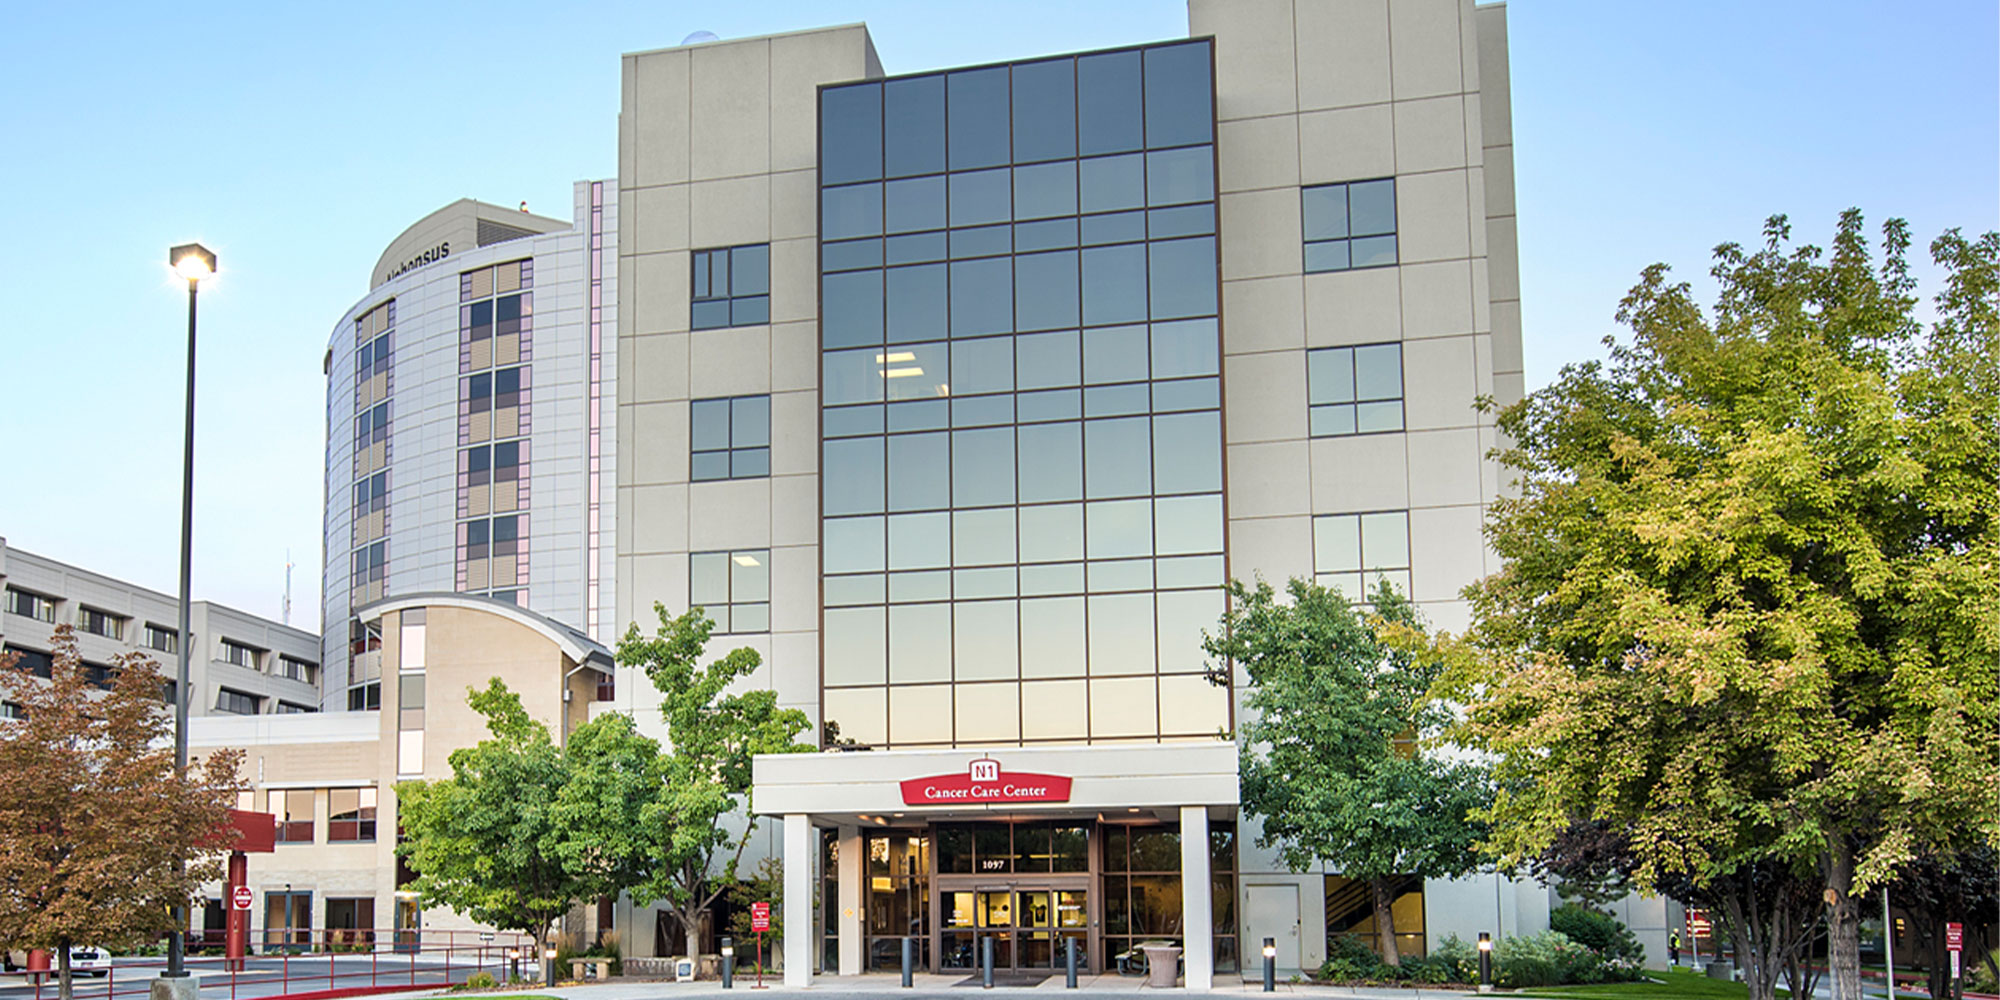 Saint Alphonsus Boise - Cancer Care Center 1055 North Curtis